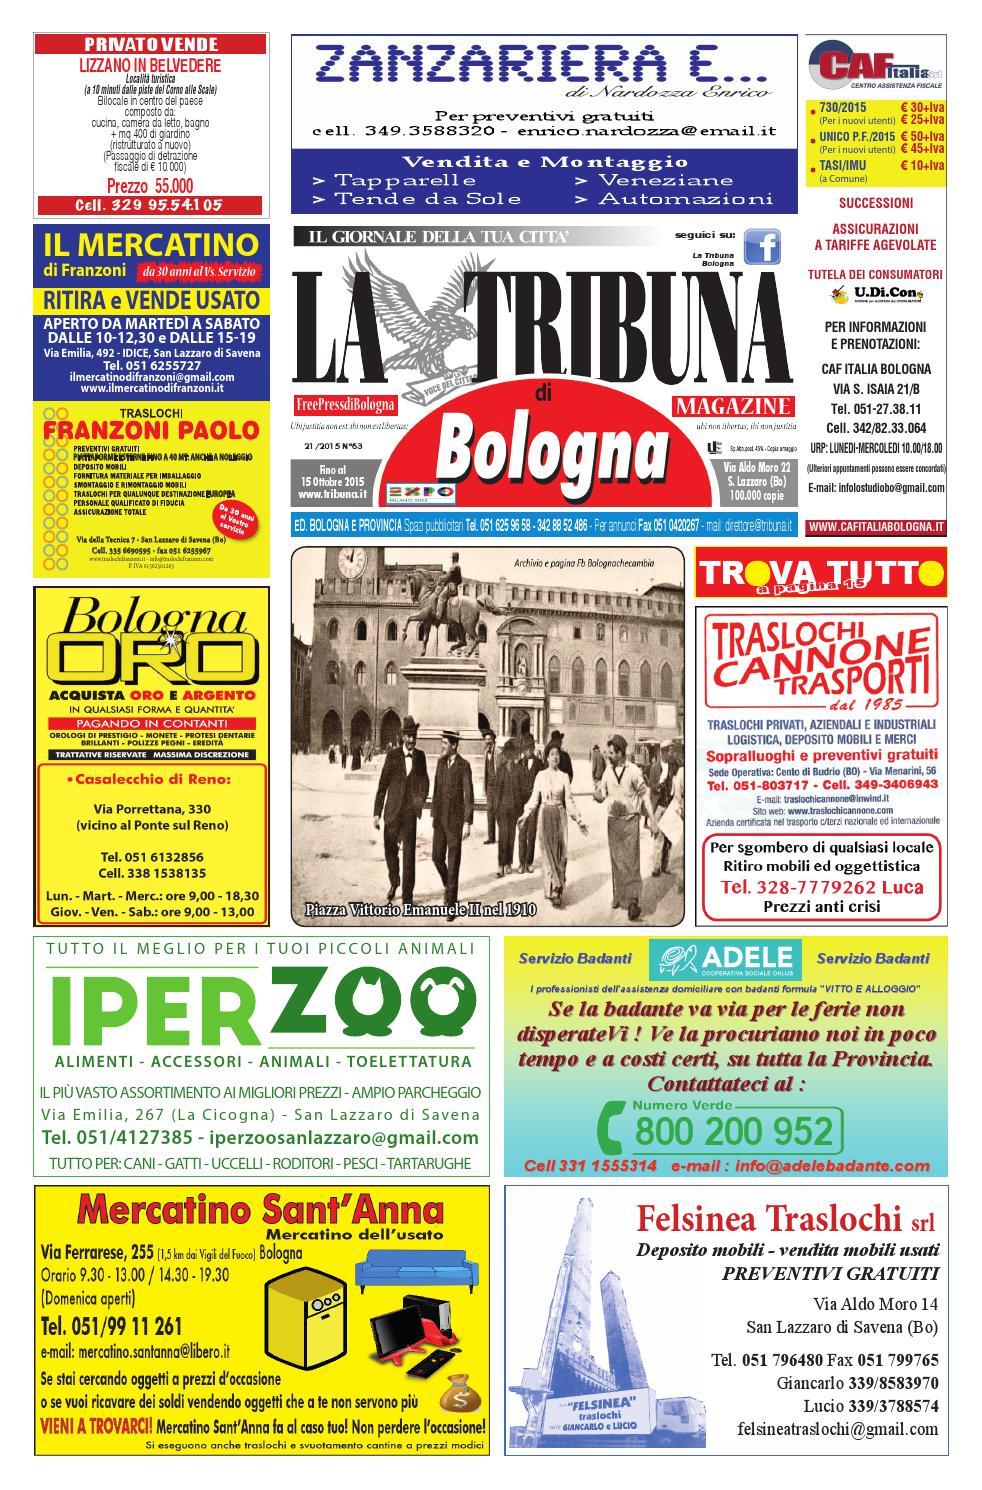 Tribuna n 63 ottobre 2015 by la tribuna srls issuu - Comune bagno a ripoli tasi ...